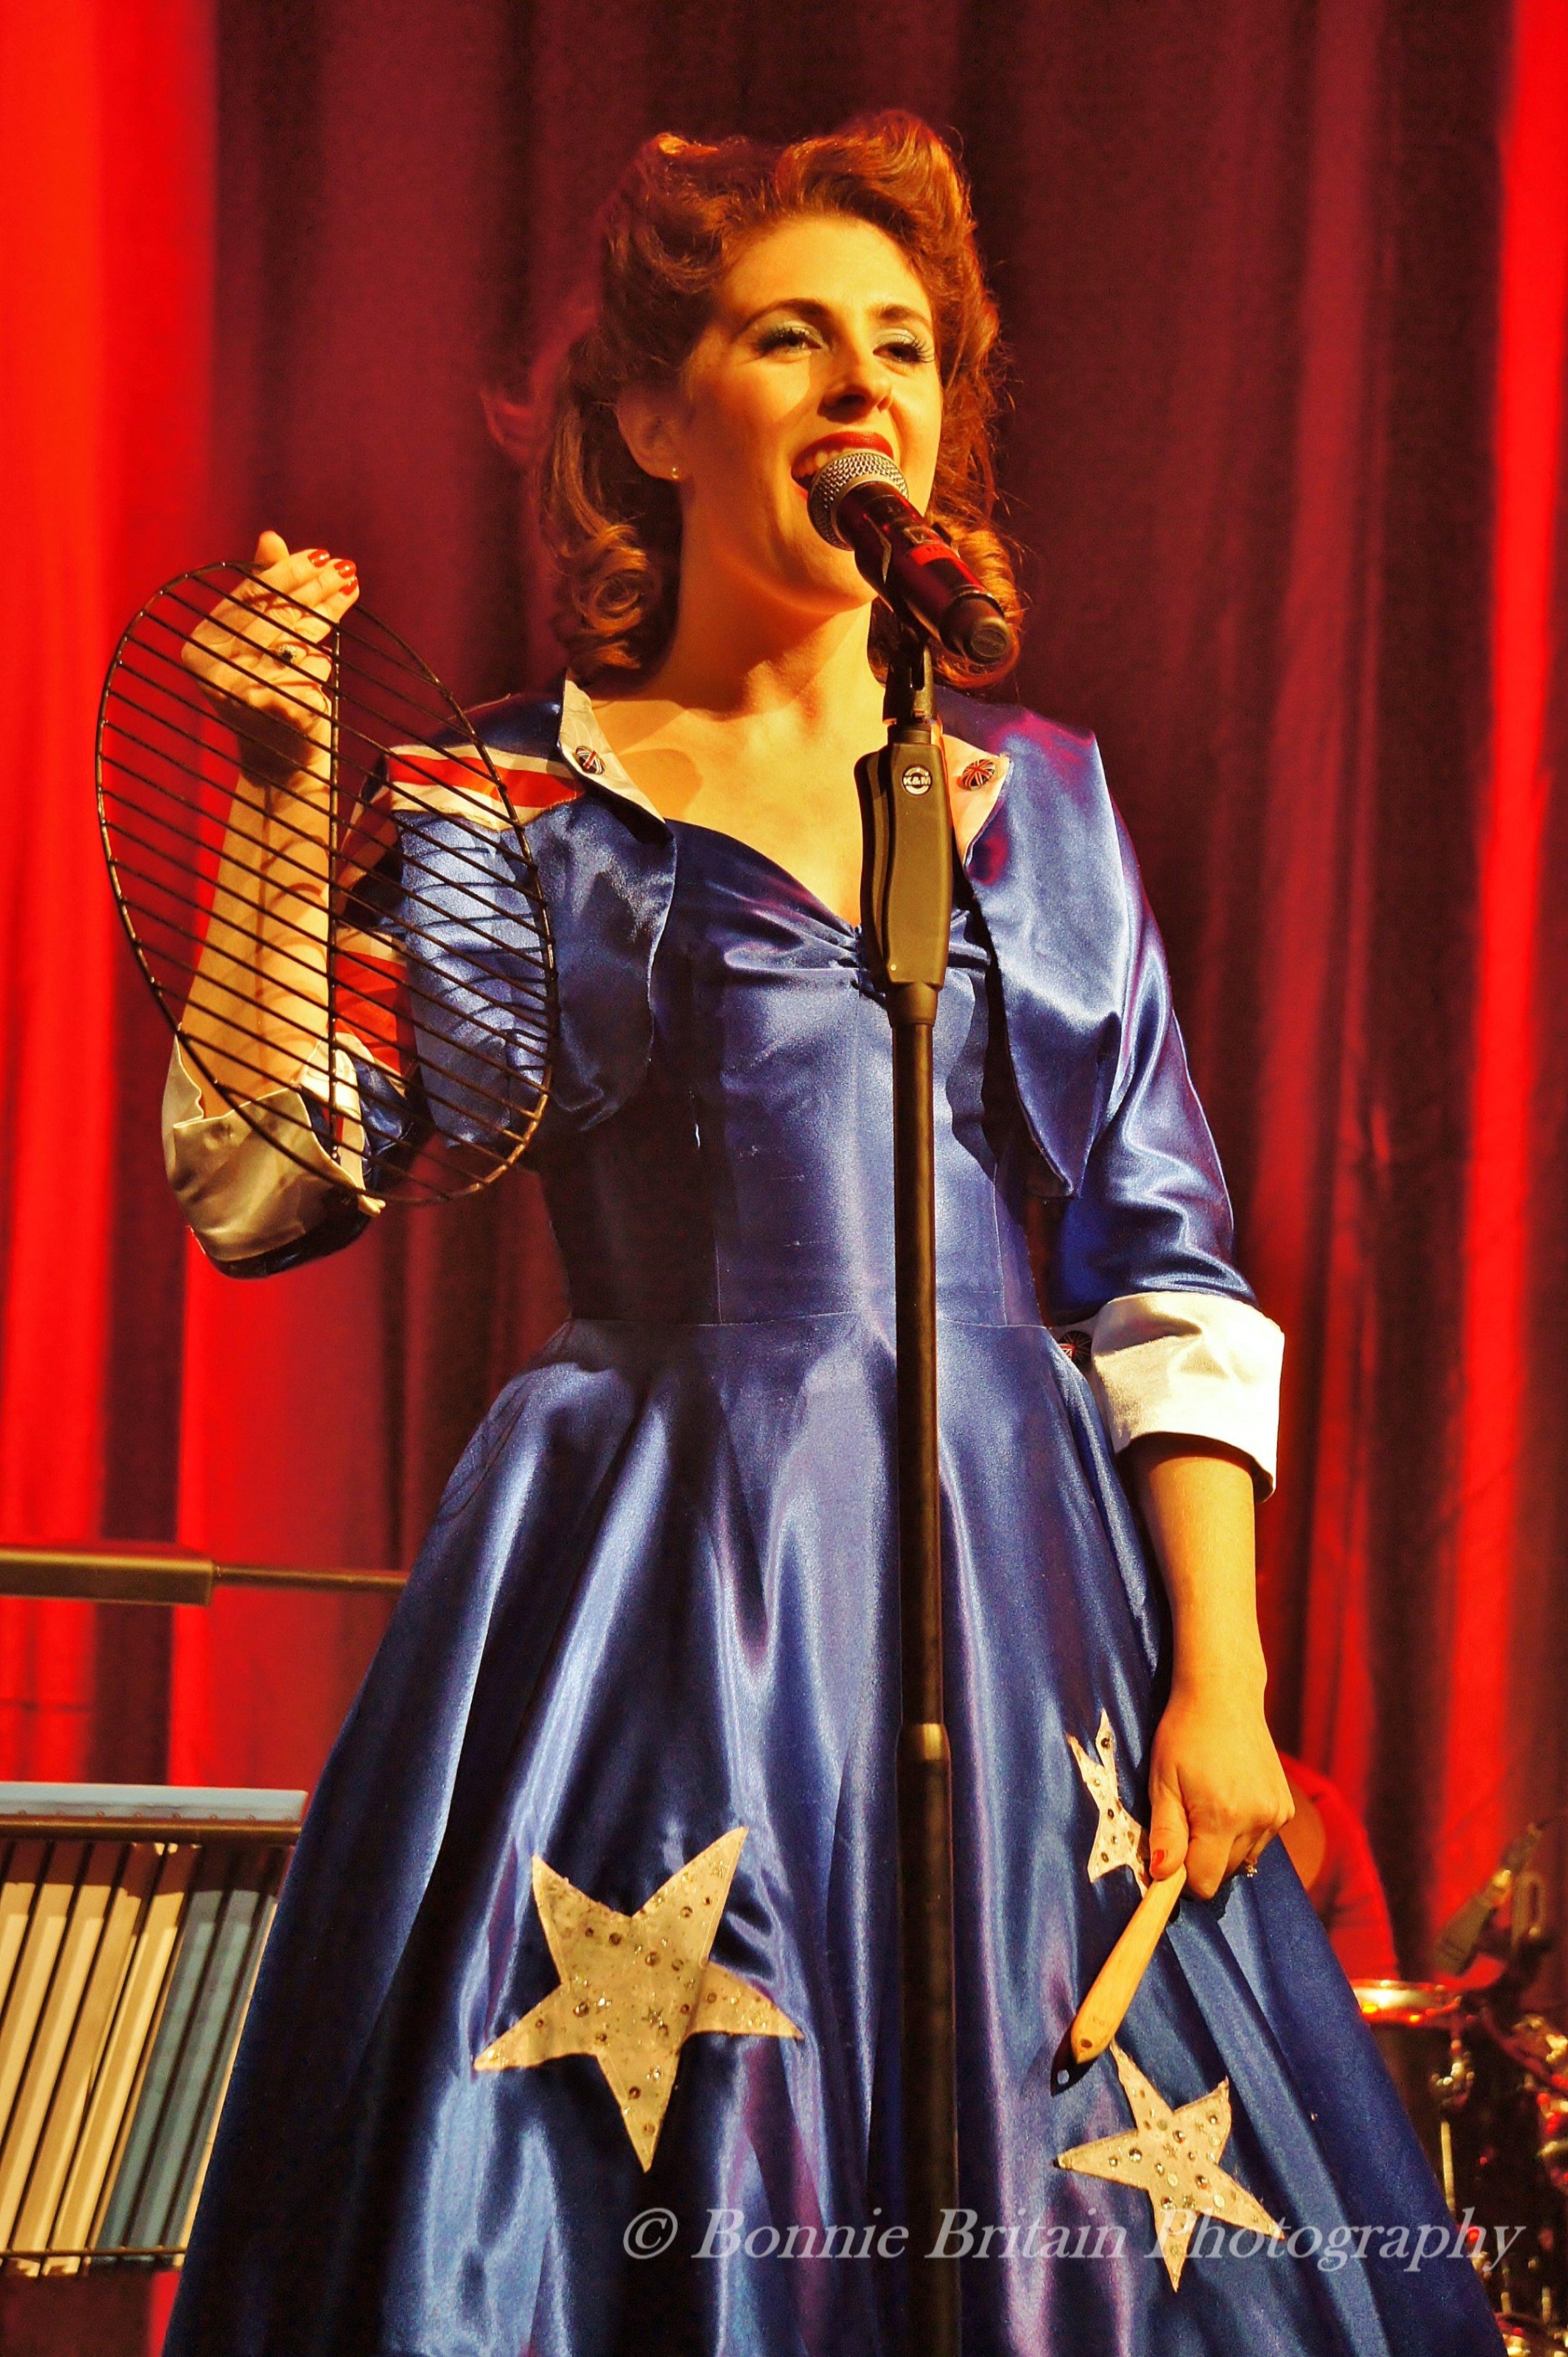 Ashleigh's BBQ grill - Live at the Hippodrome  Photo credit: Bonnie Britain